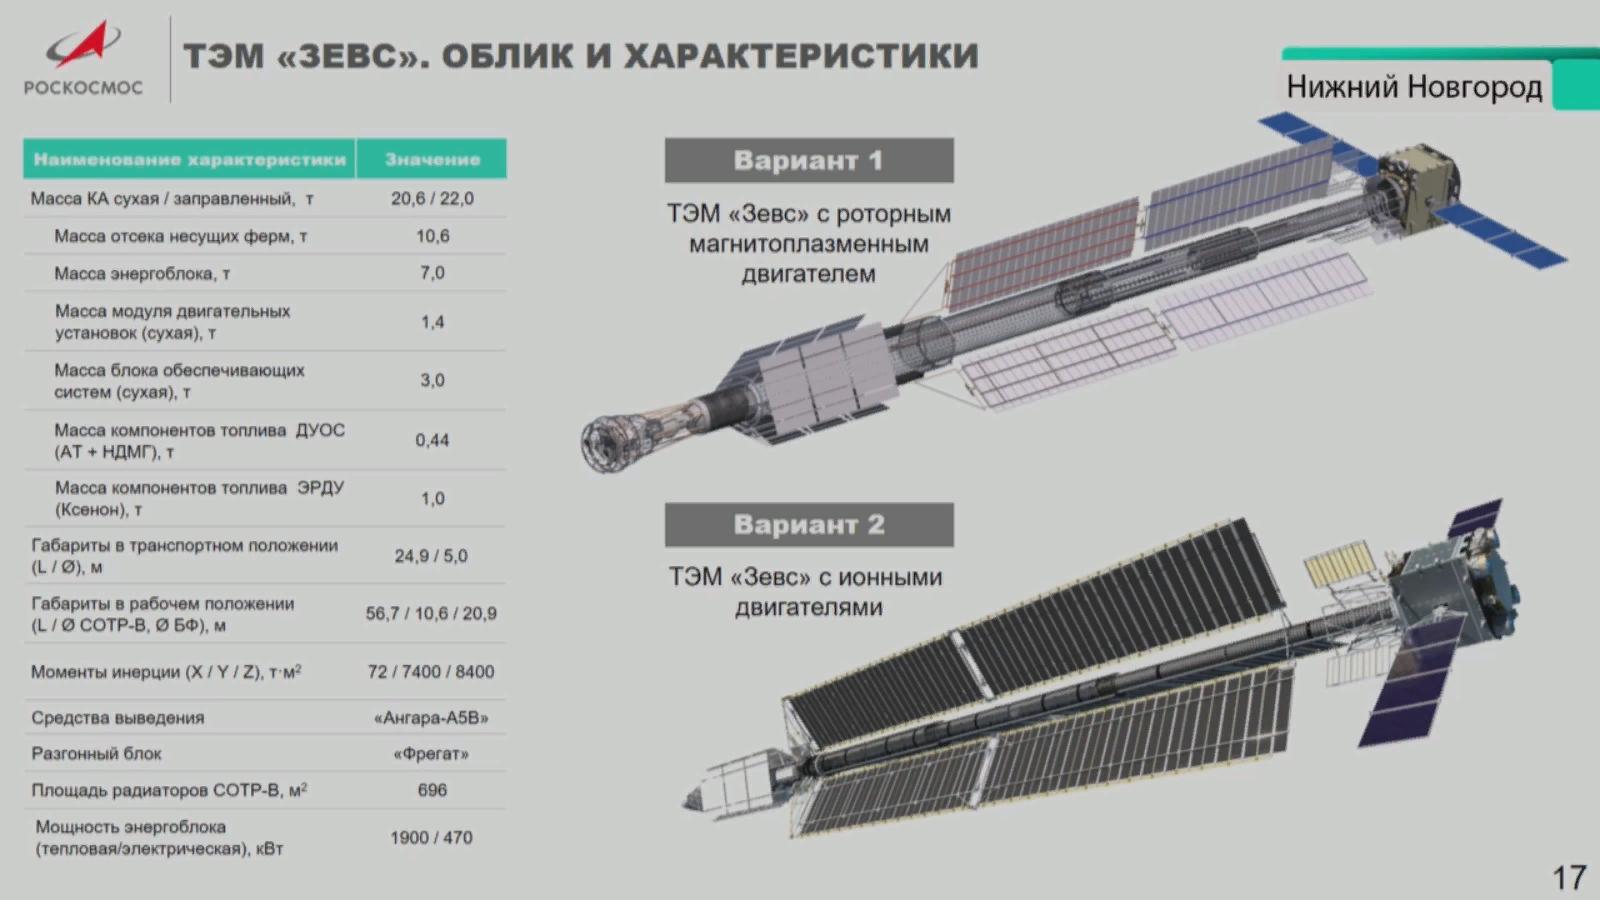 характеристики ТЭМ  из презентации Блошенко